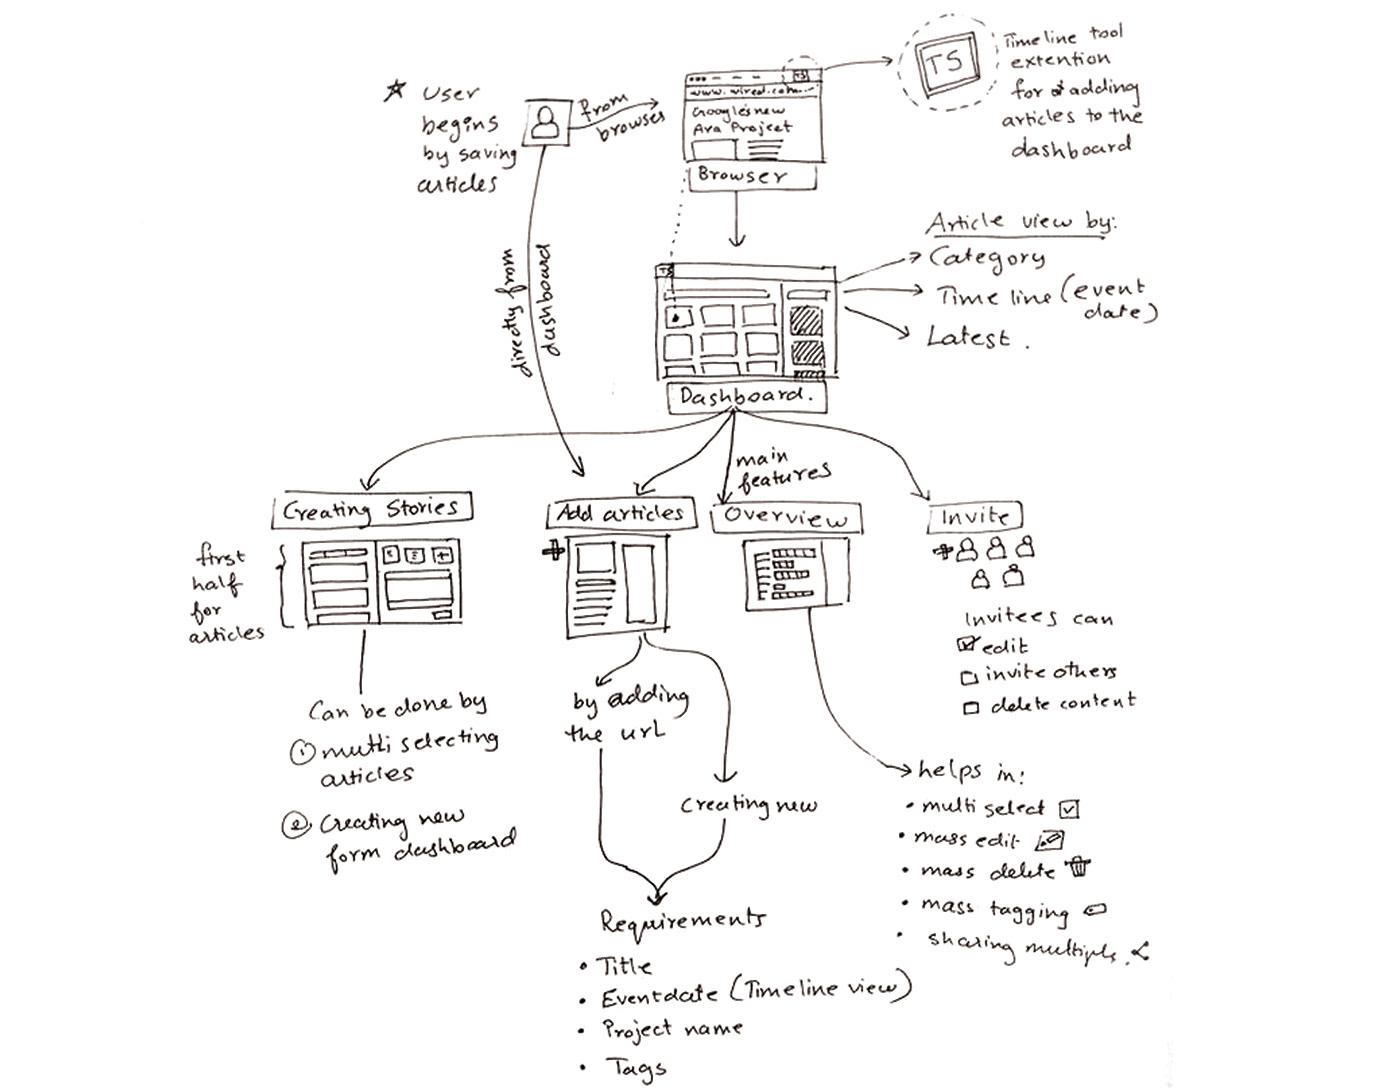 system design,Service design,UX design,Interaction design ,research,Internet,data visualisation,Data,information architecture ,wireframing